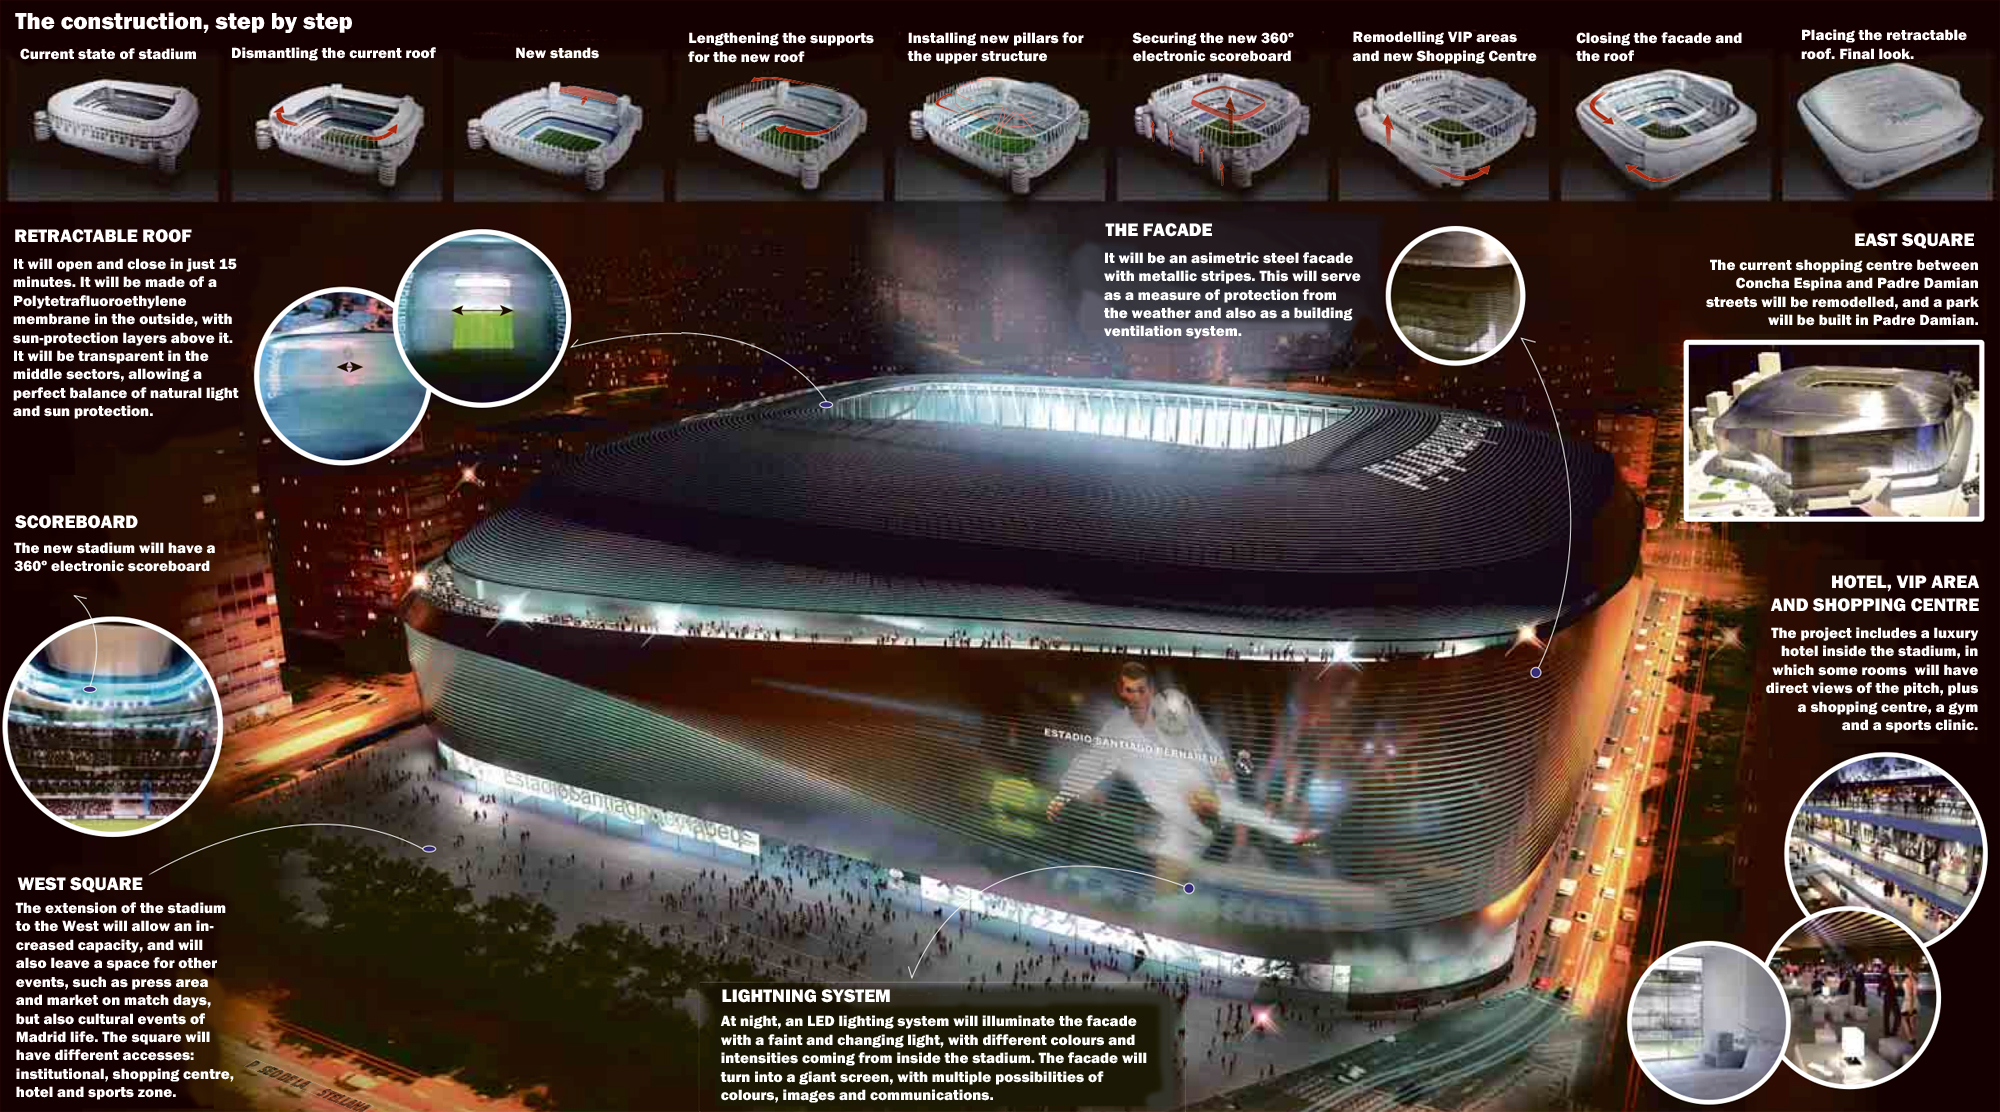 infographic-santiago-bernabeu-new-stadium